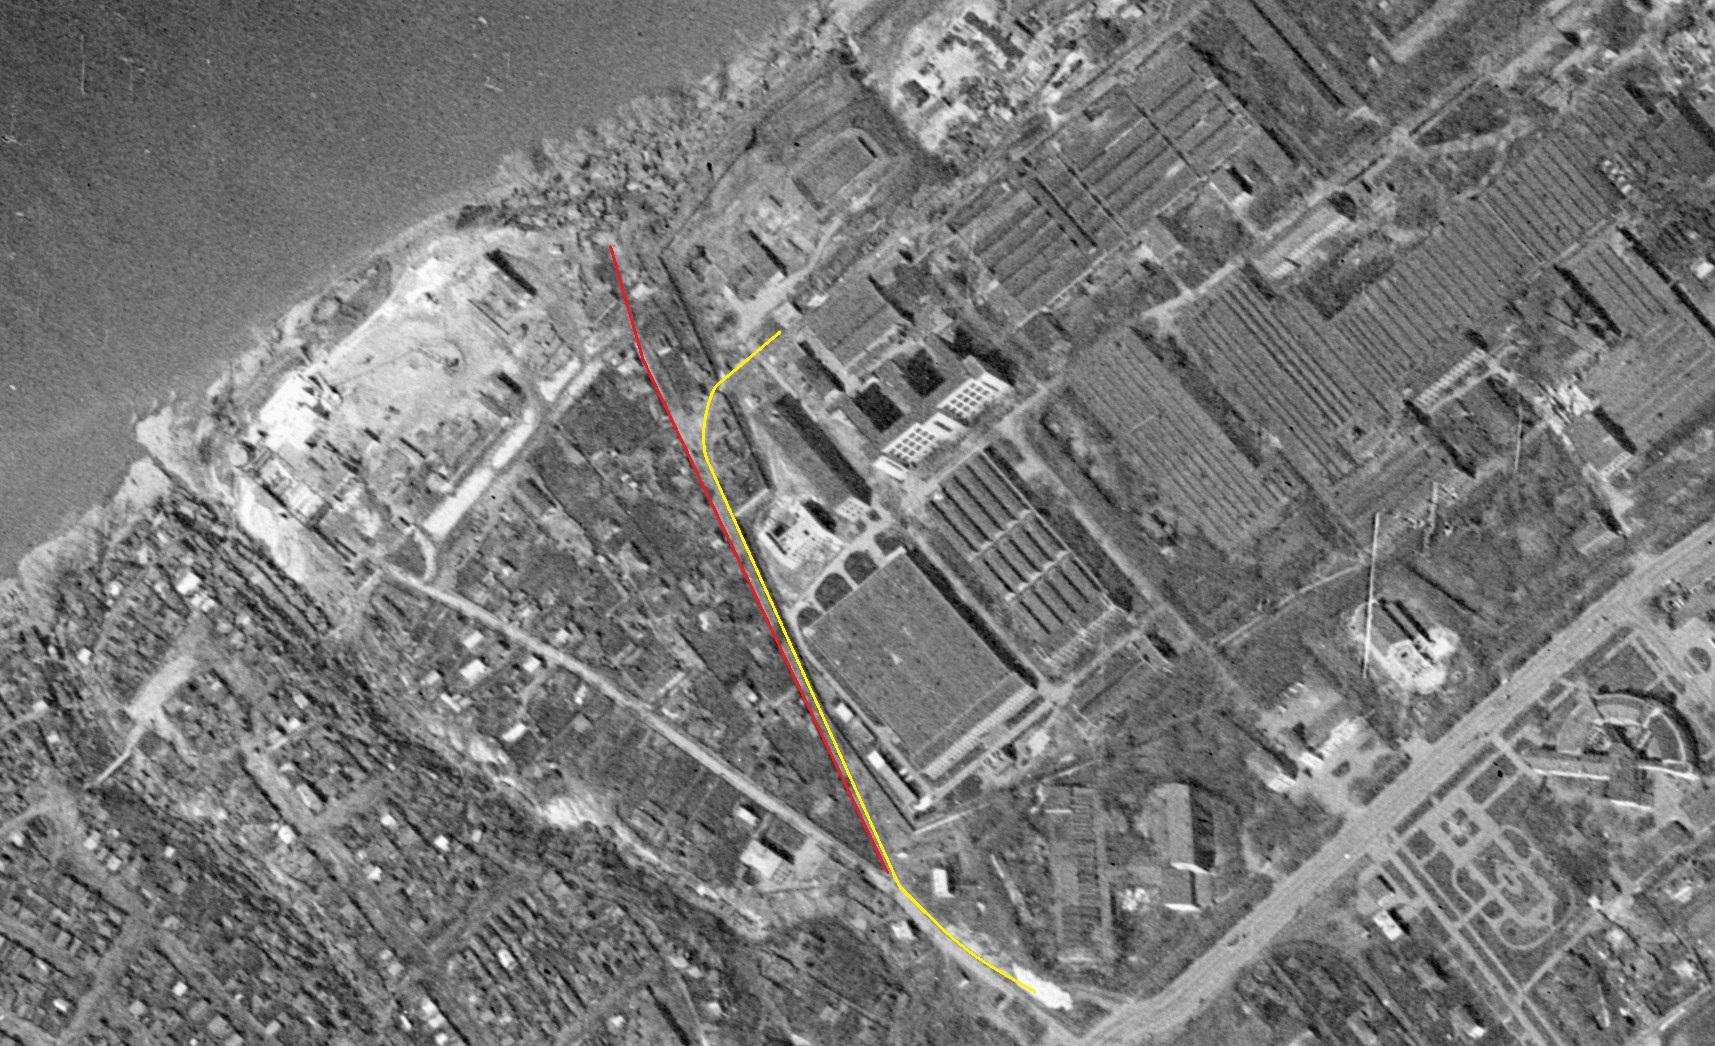 Улица Мусоргского 1965 год